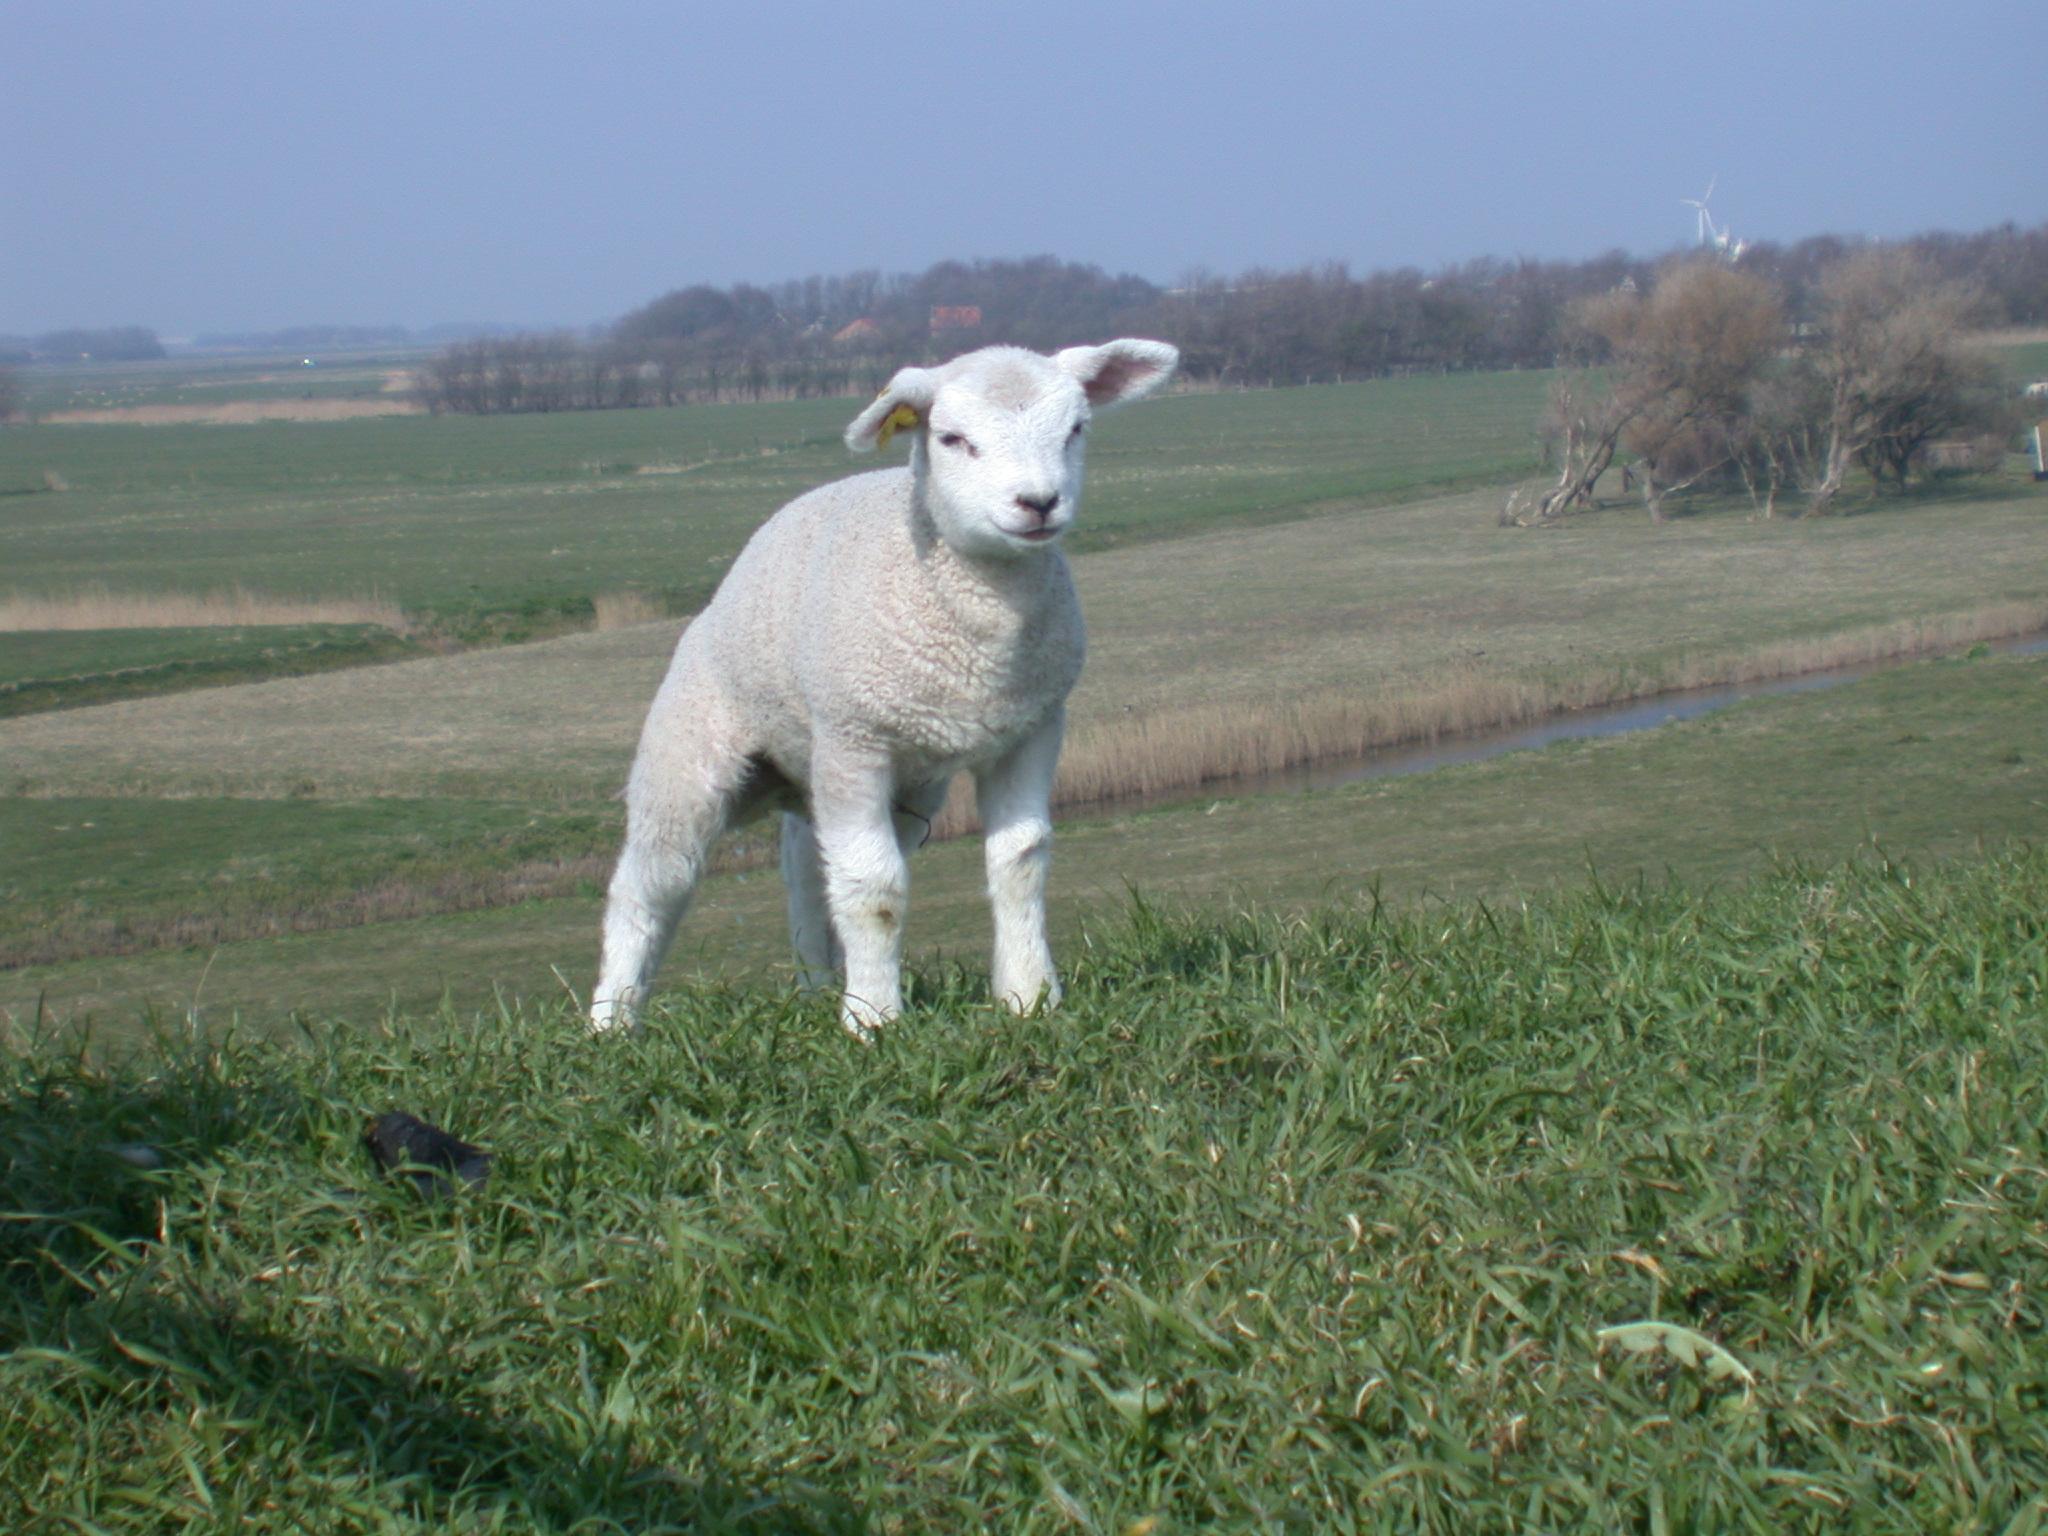 little lamp cute farm animal whool white head small field fields grass free